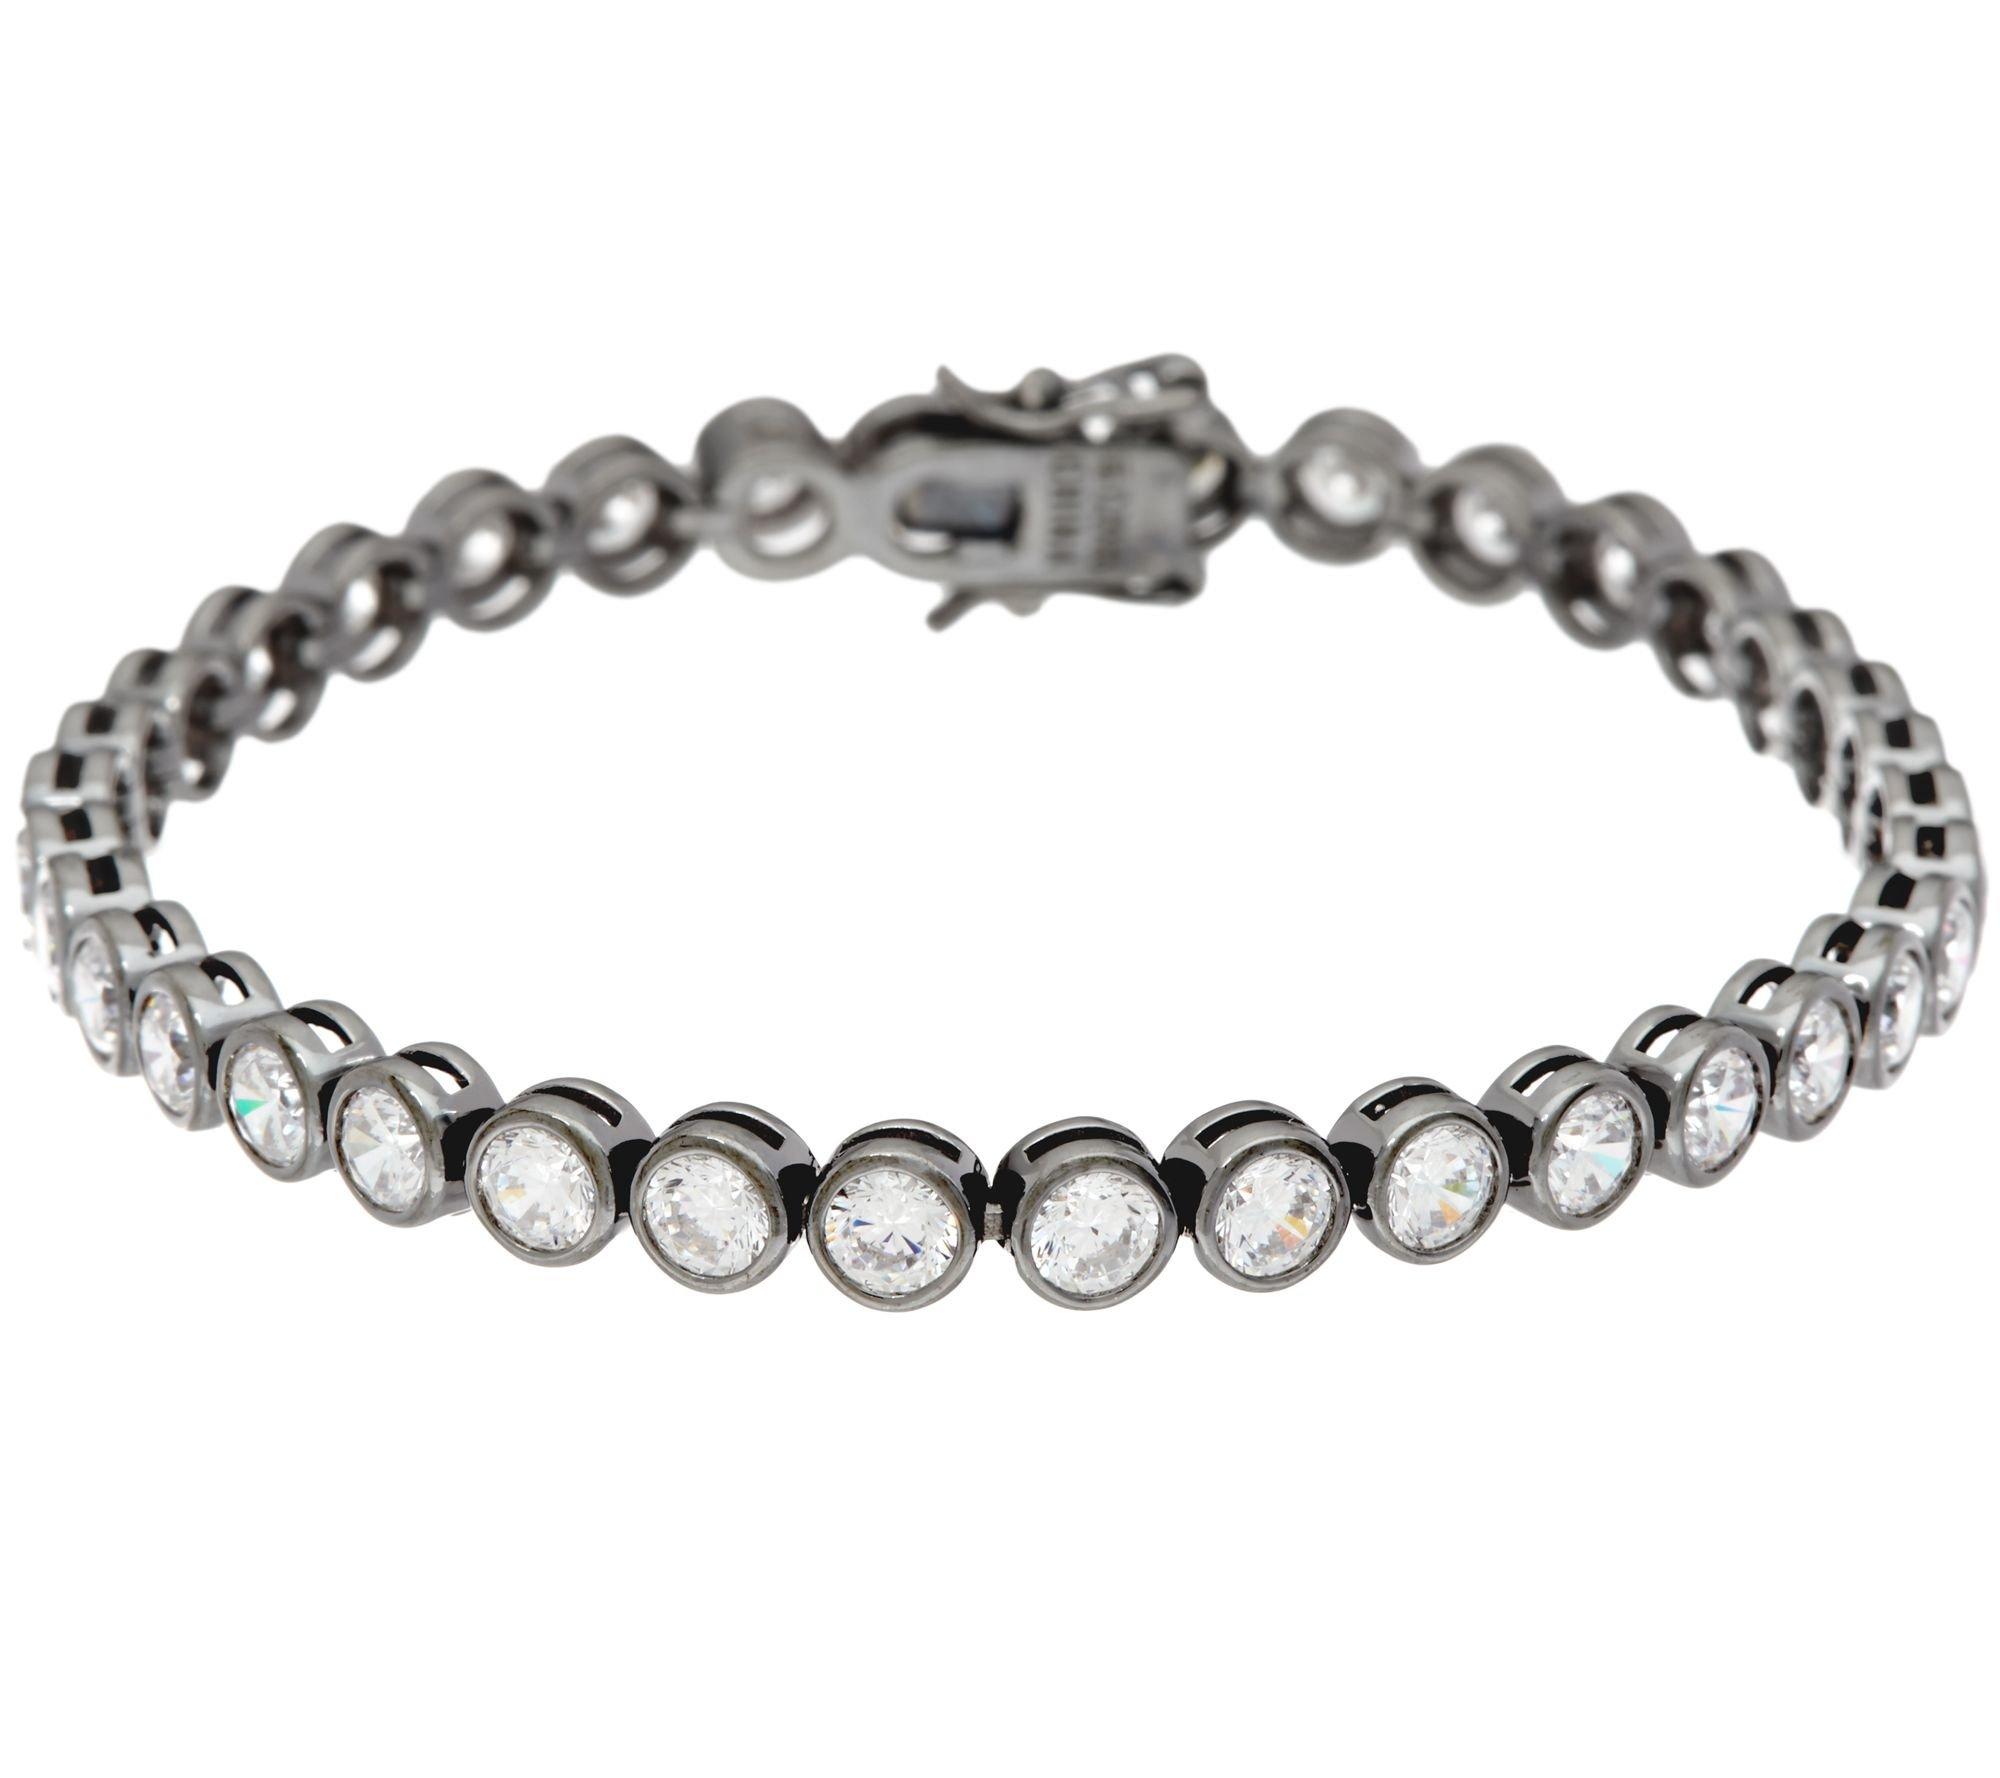 Silvernshine Jewels 7.60 Carat Round Bezel Set D/VVS1 Diamond Black Rhodium-Plated Tennis Bracelet by Silvernshine Jewels